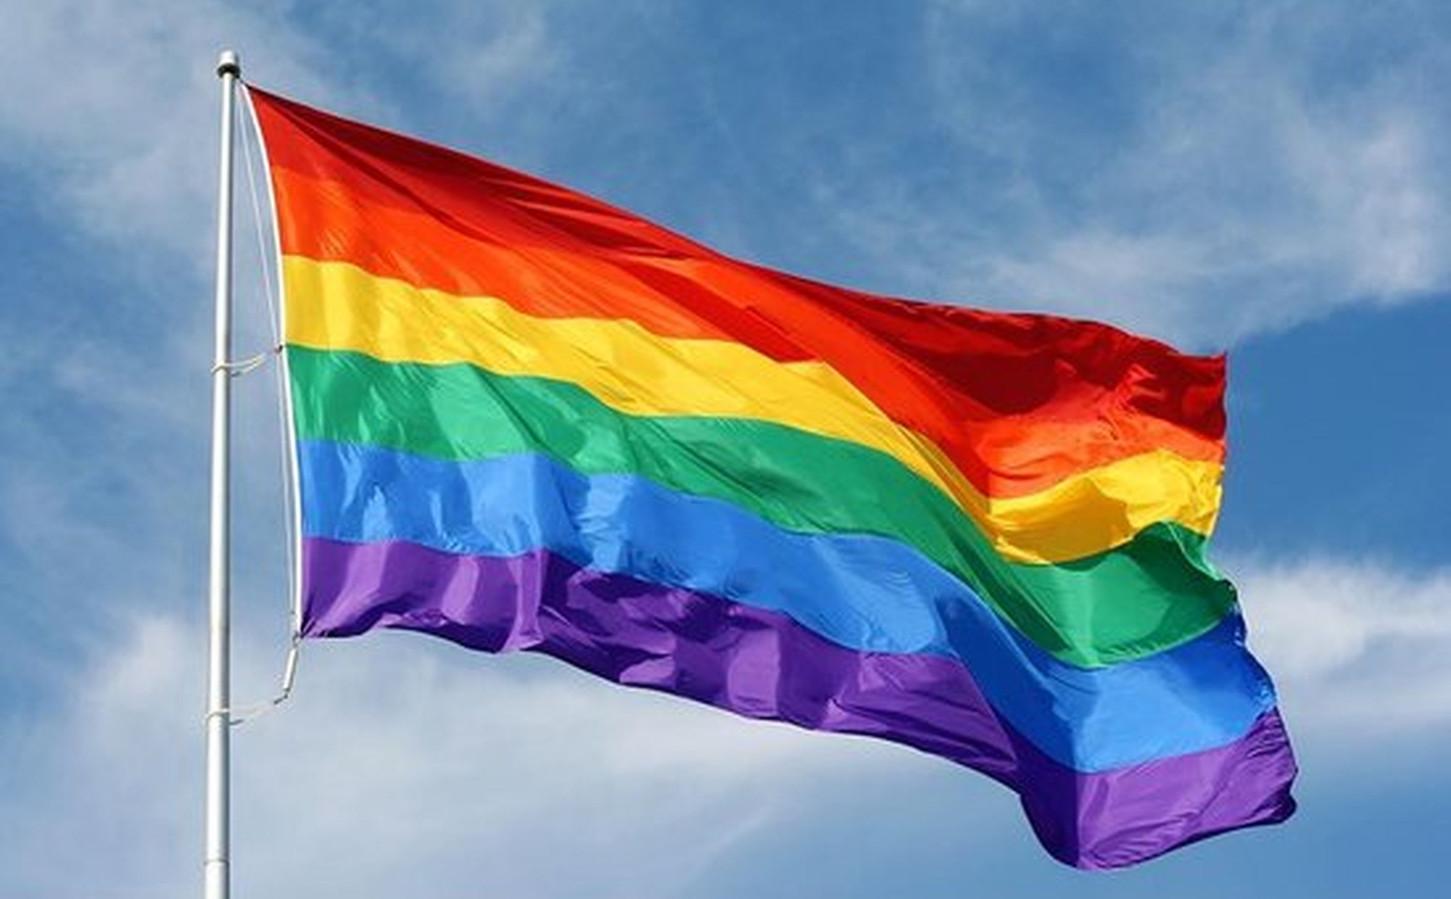 De regenboogvlag